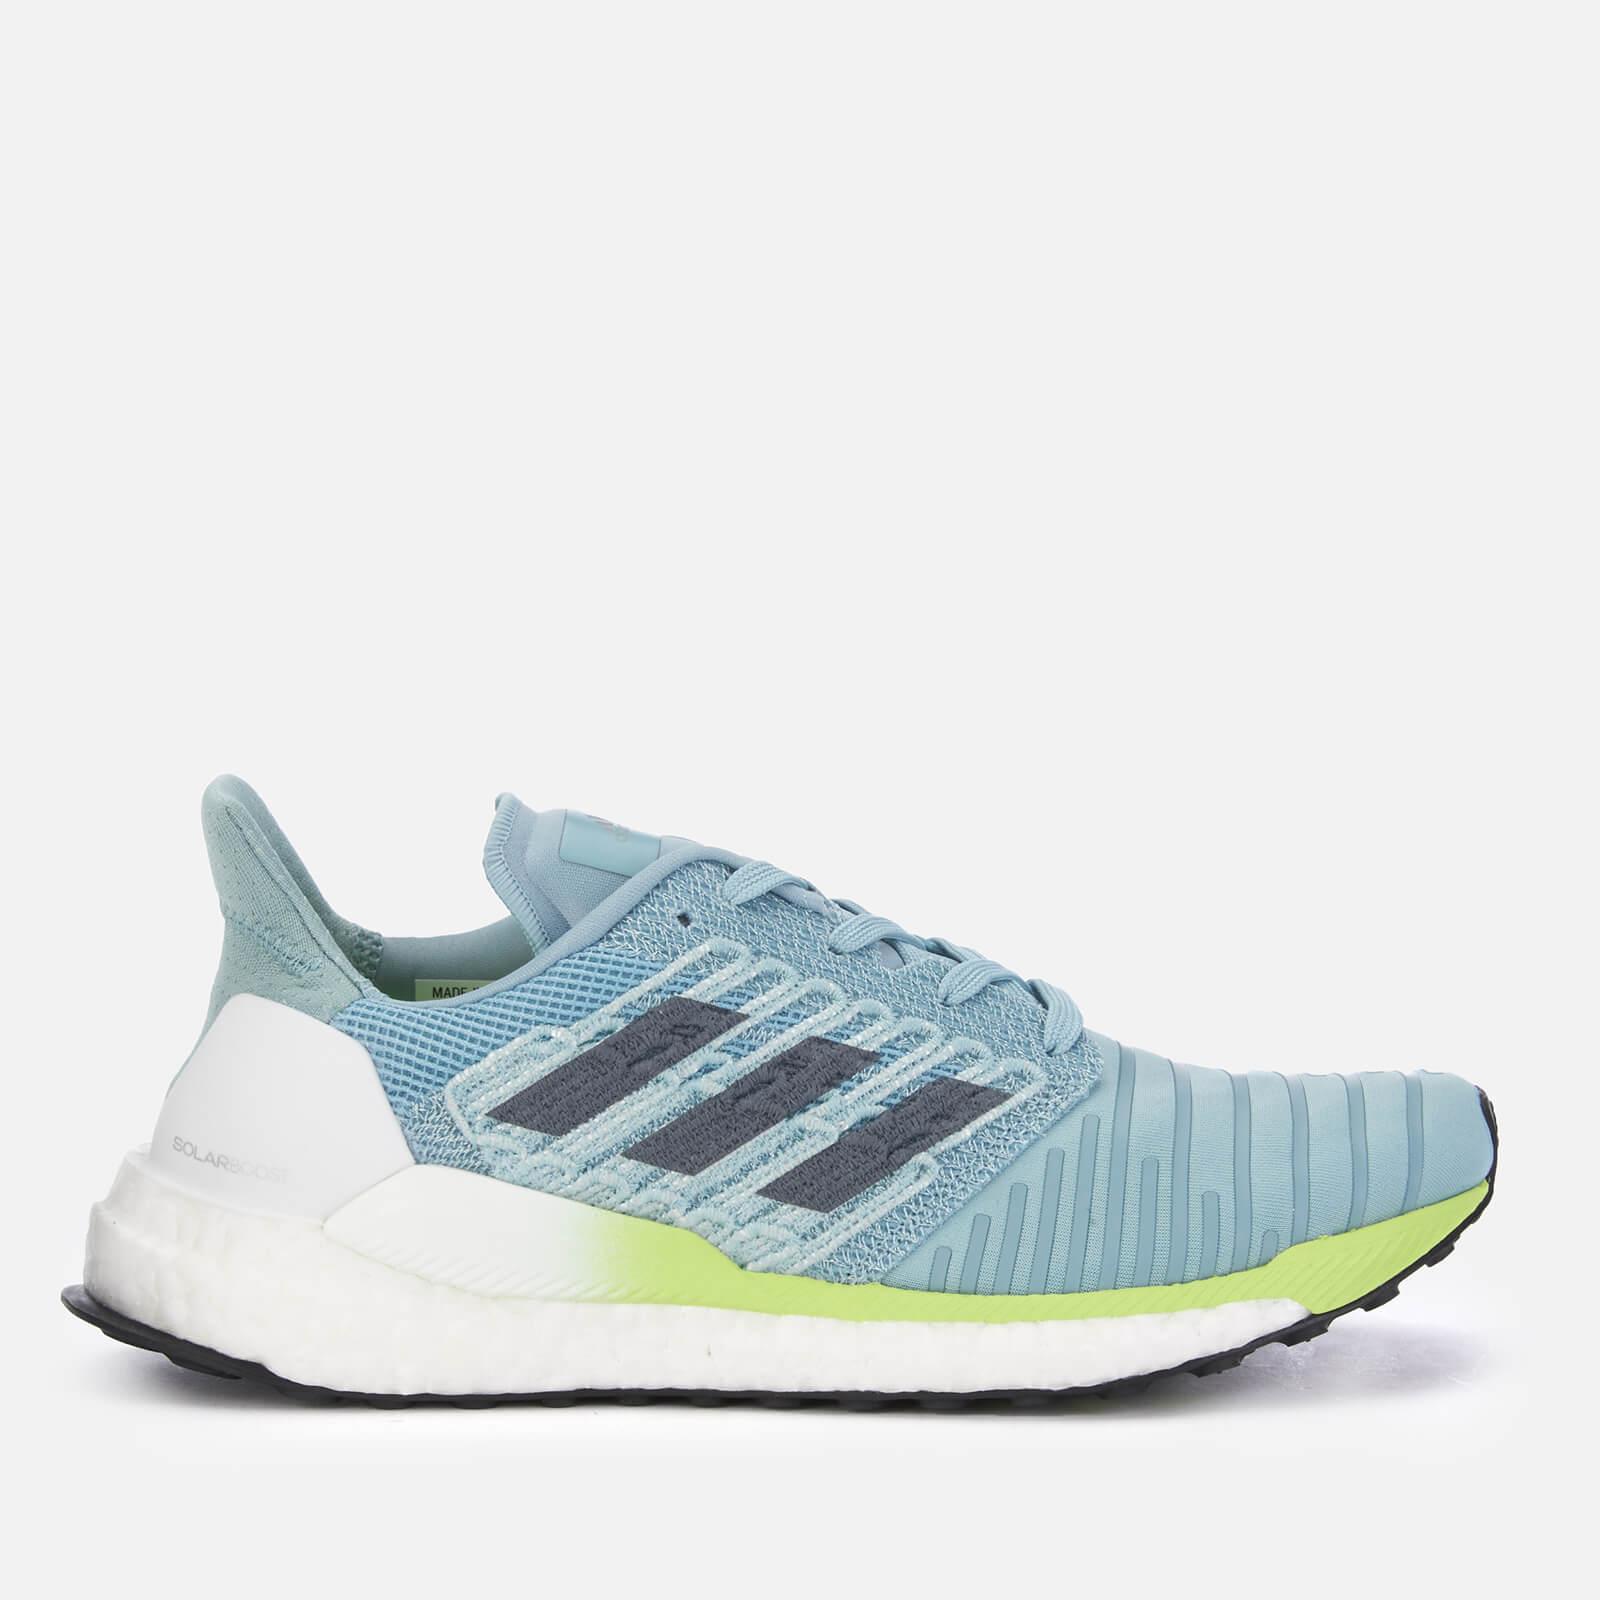 hot sale online 29779 9d830 adidas Women's Solar Boost Trainers - Ash Grey